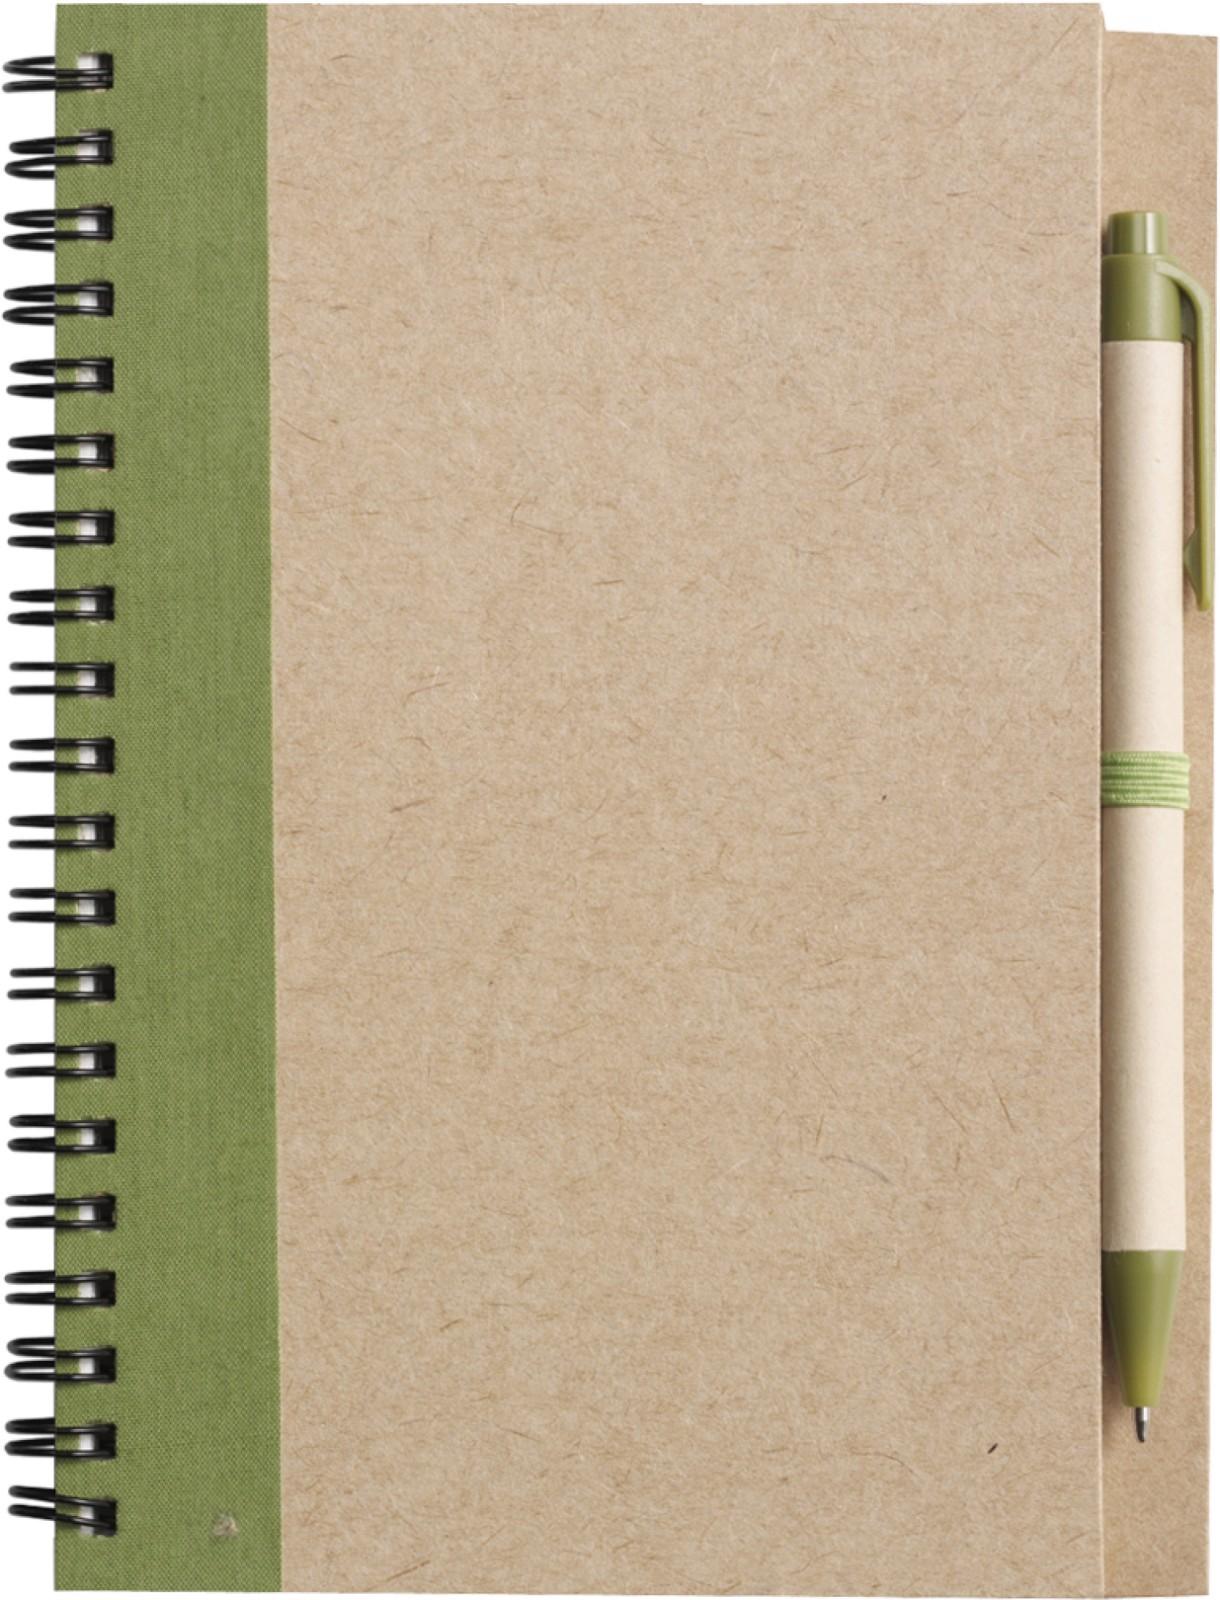 Wire bound notebook with ballpen. - Light Green